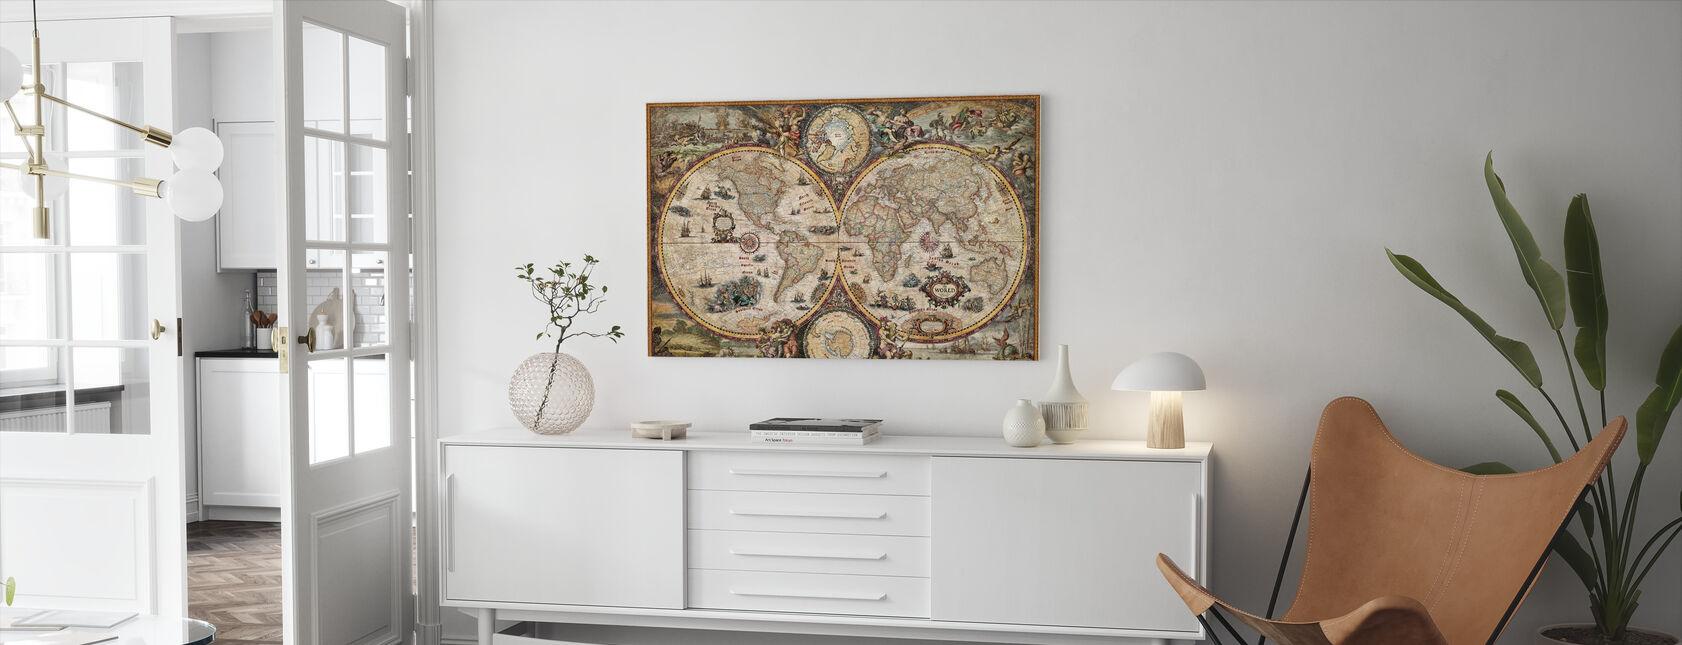 Vintage Verden - Lerretsbilde - Stue